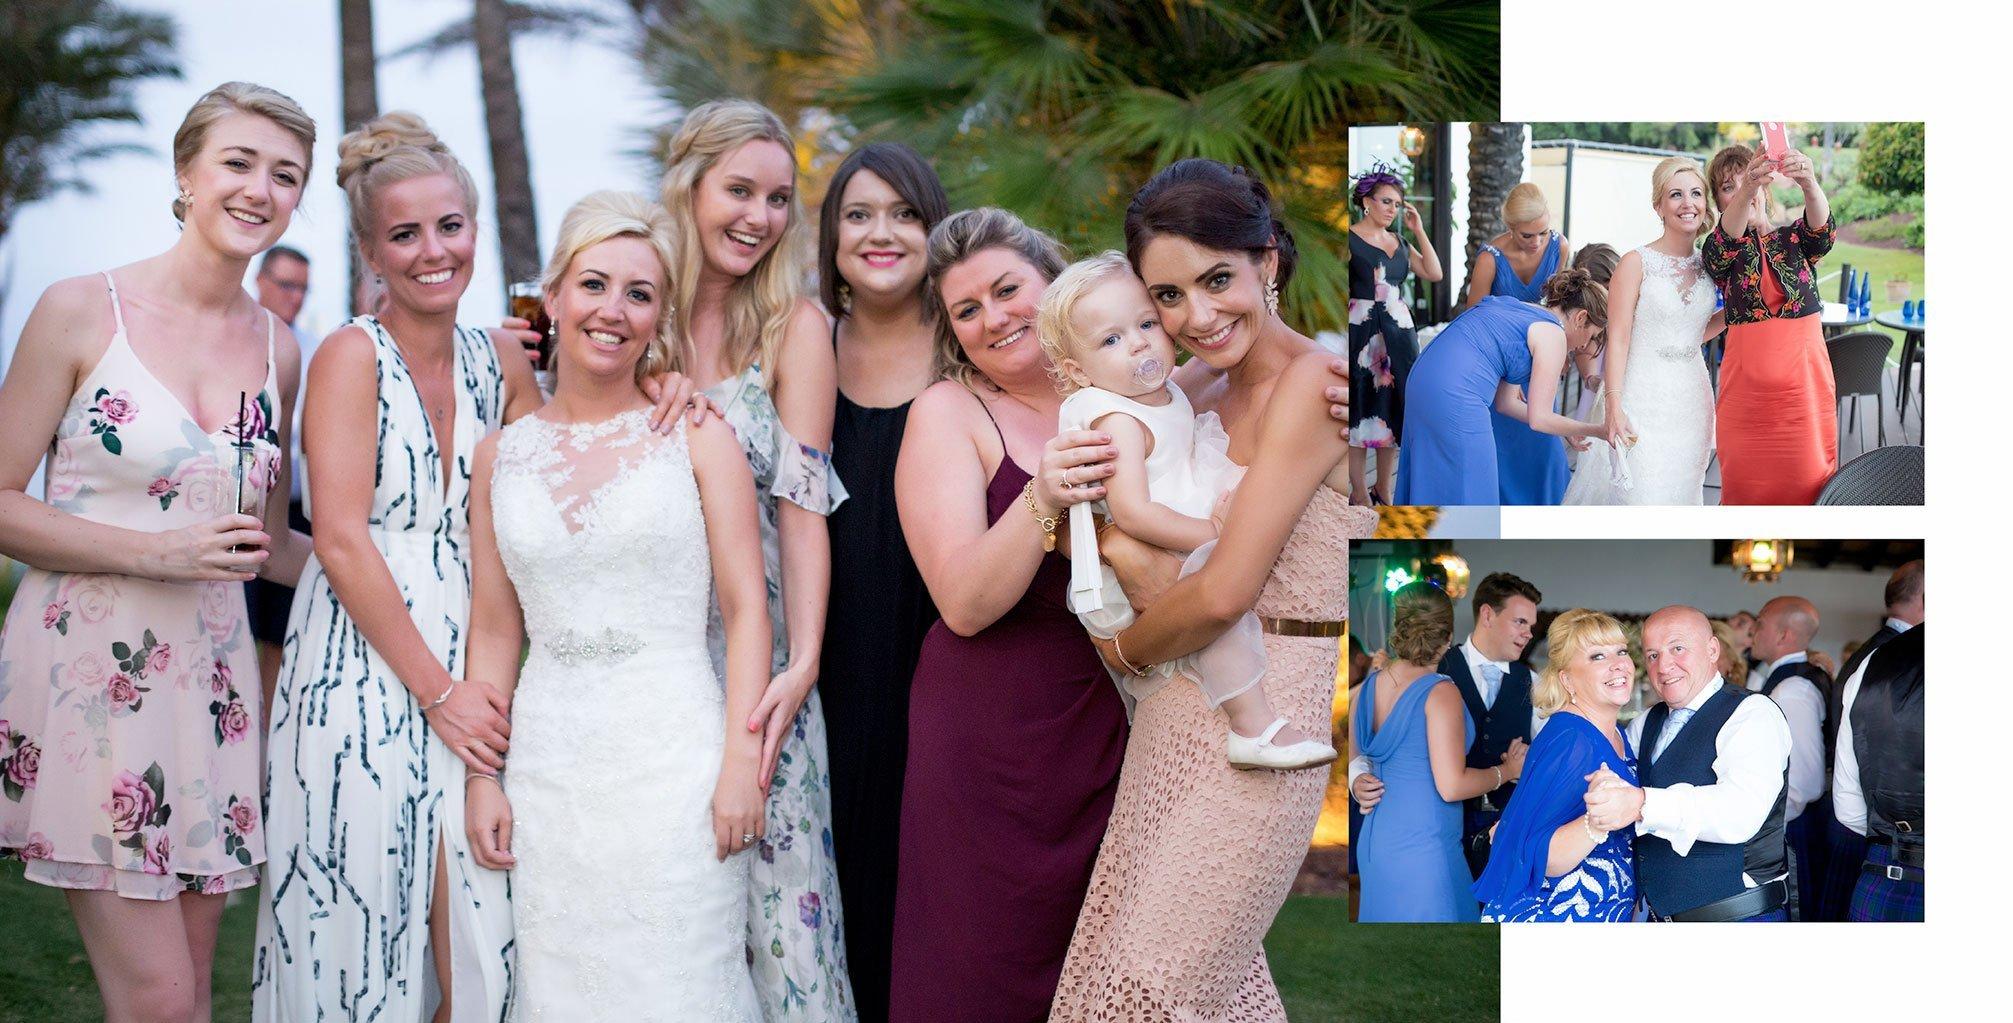 kempinski wedding marbella